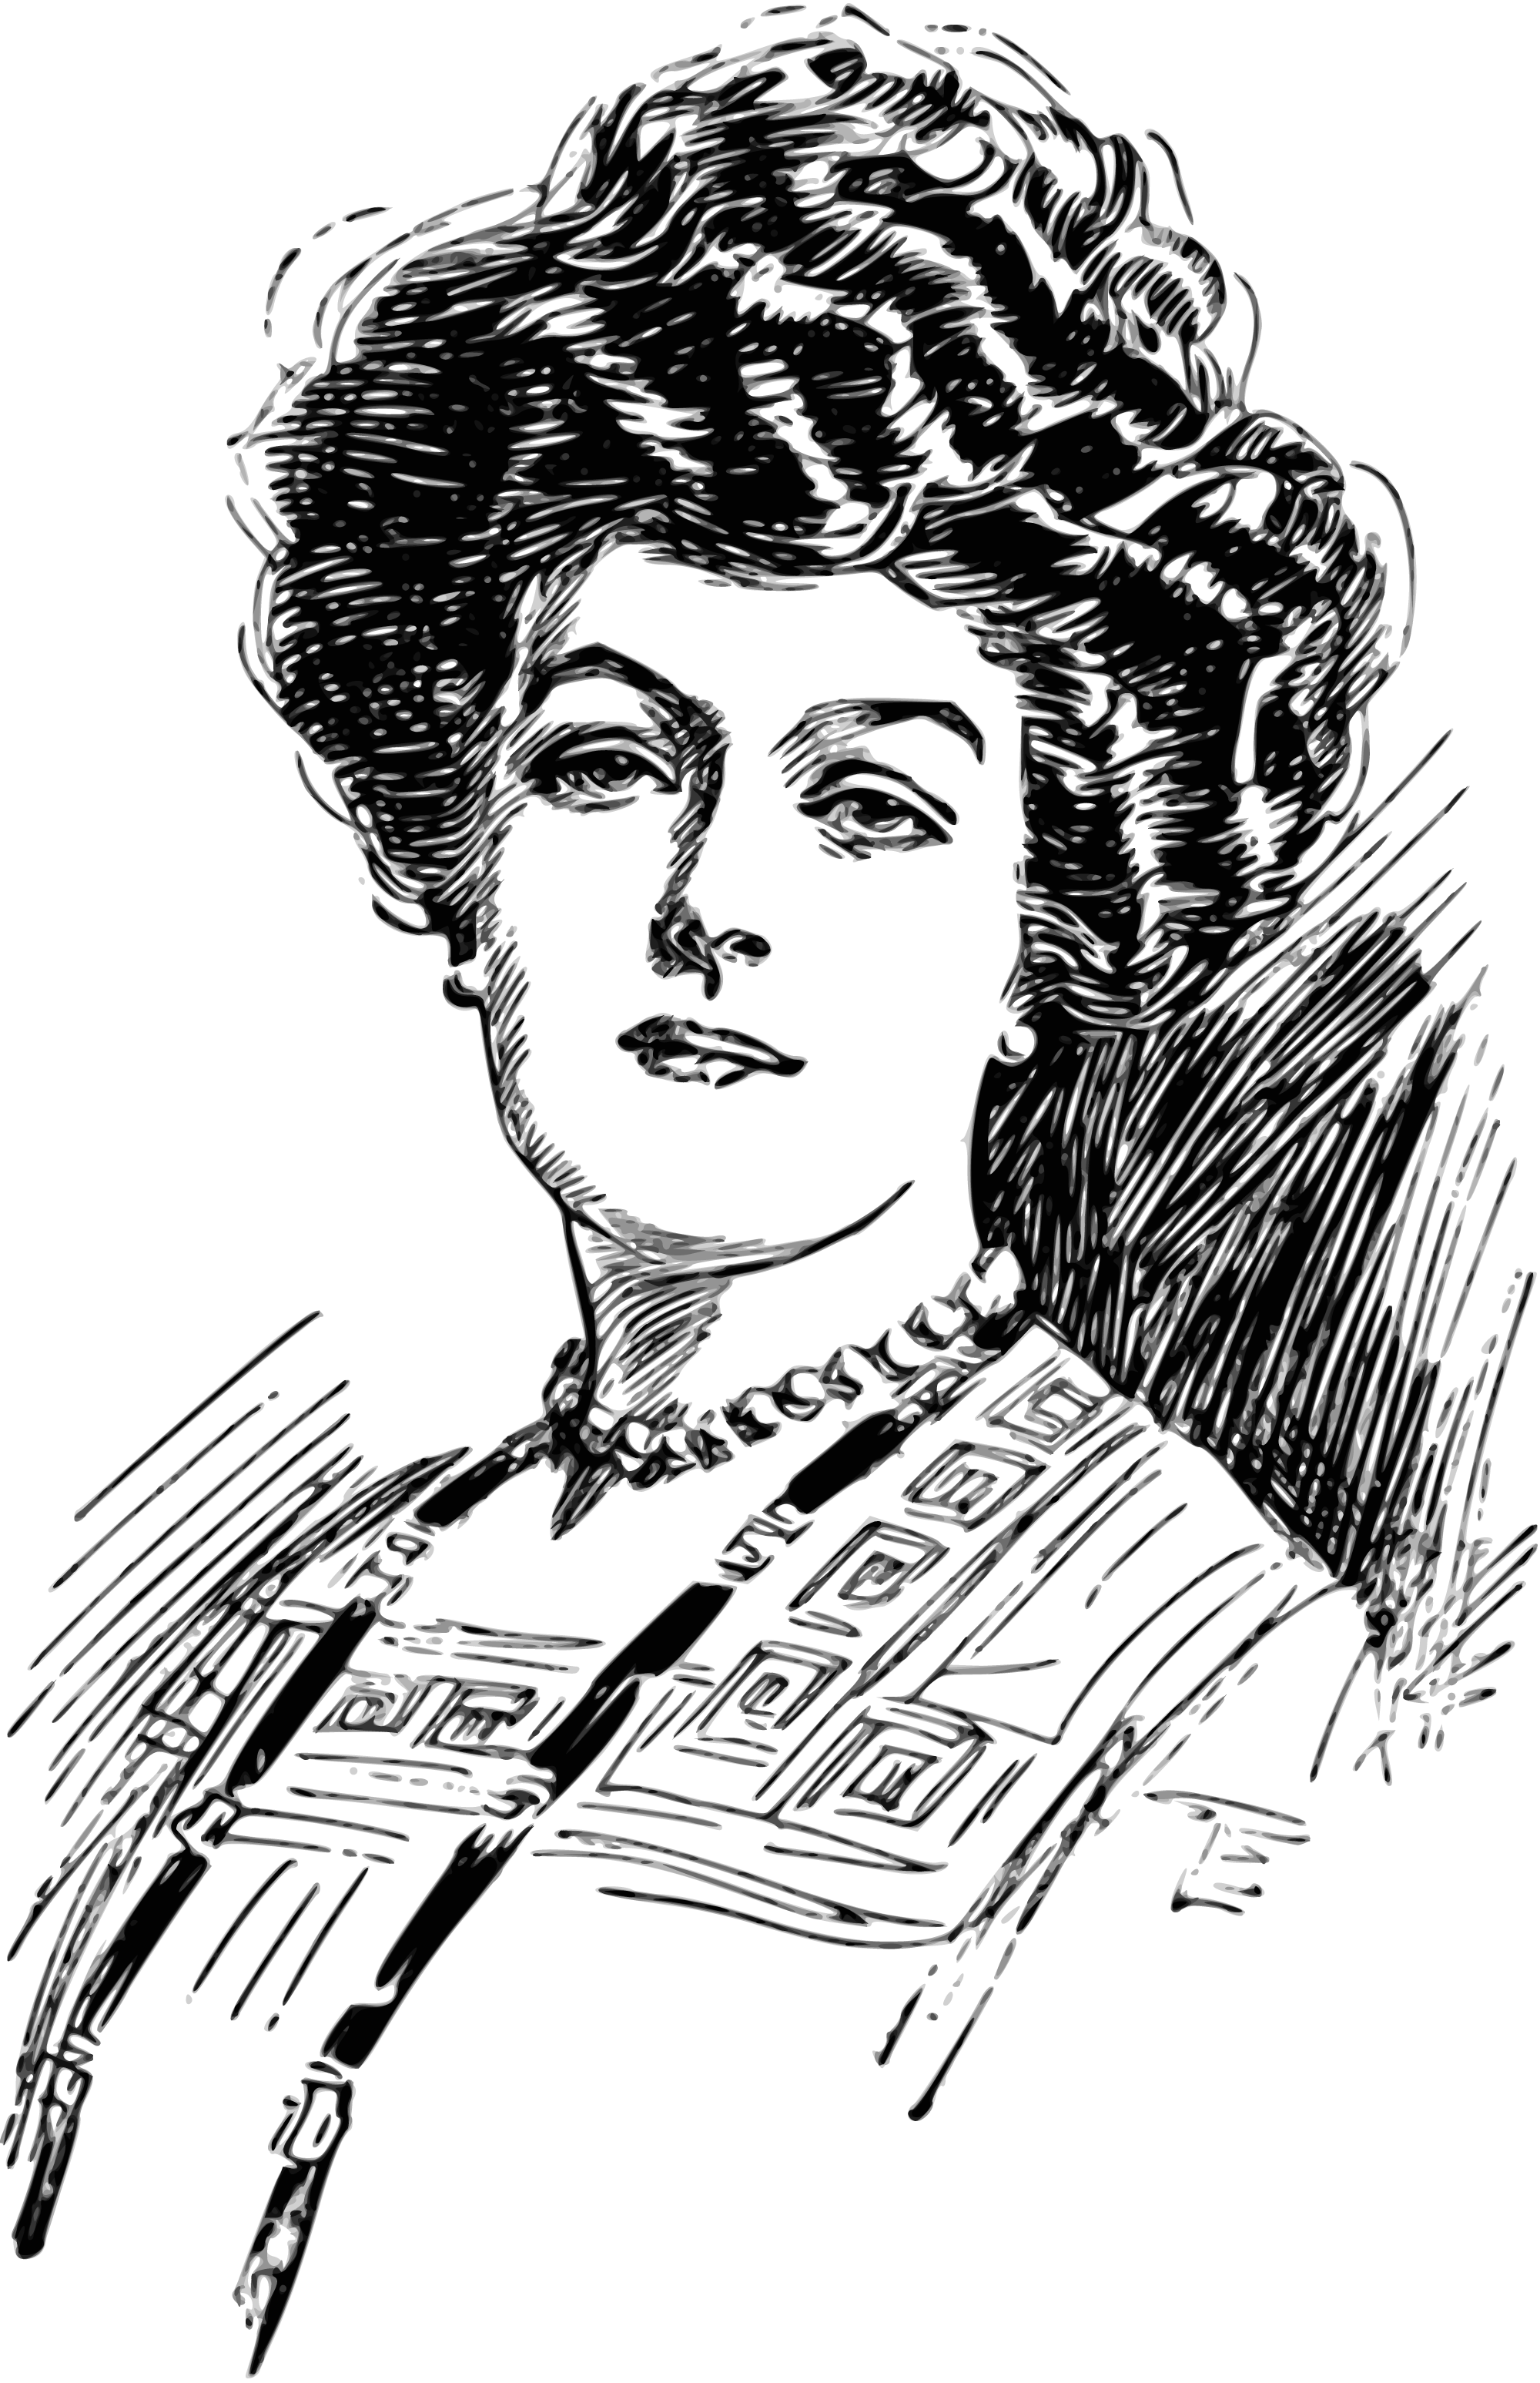 Lady Woman Vintage Drawing Free Image